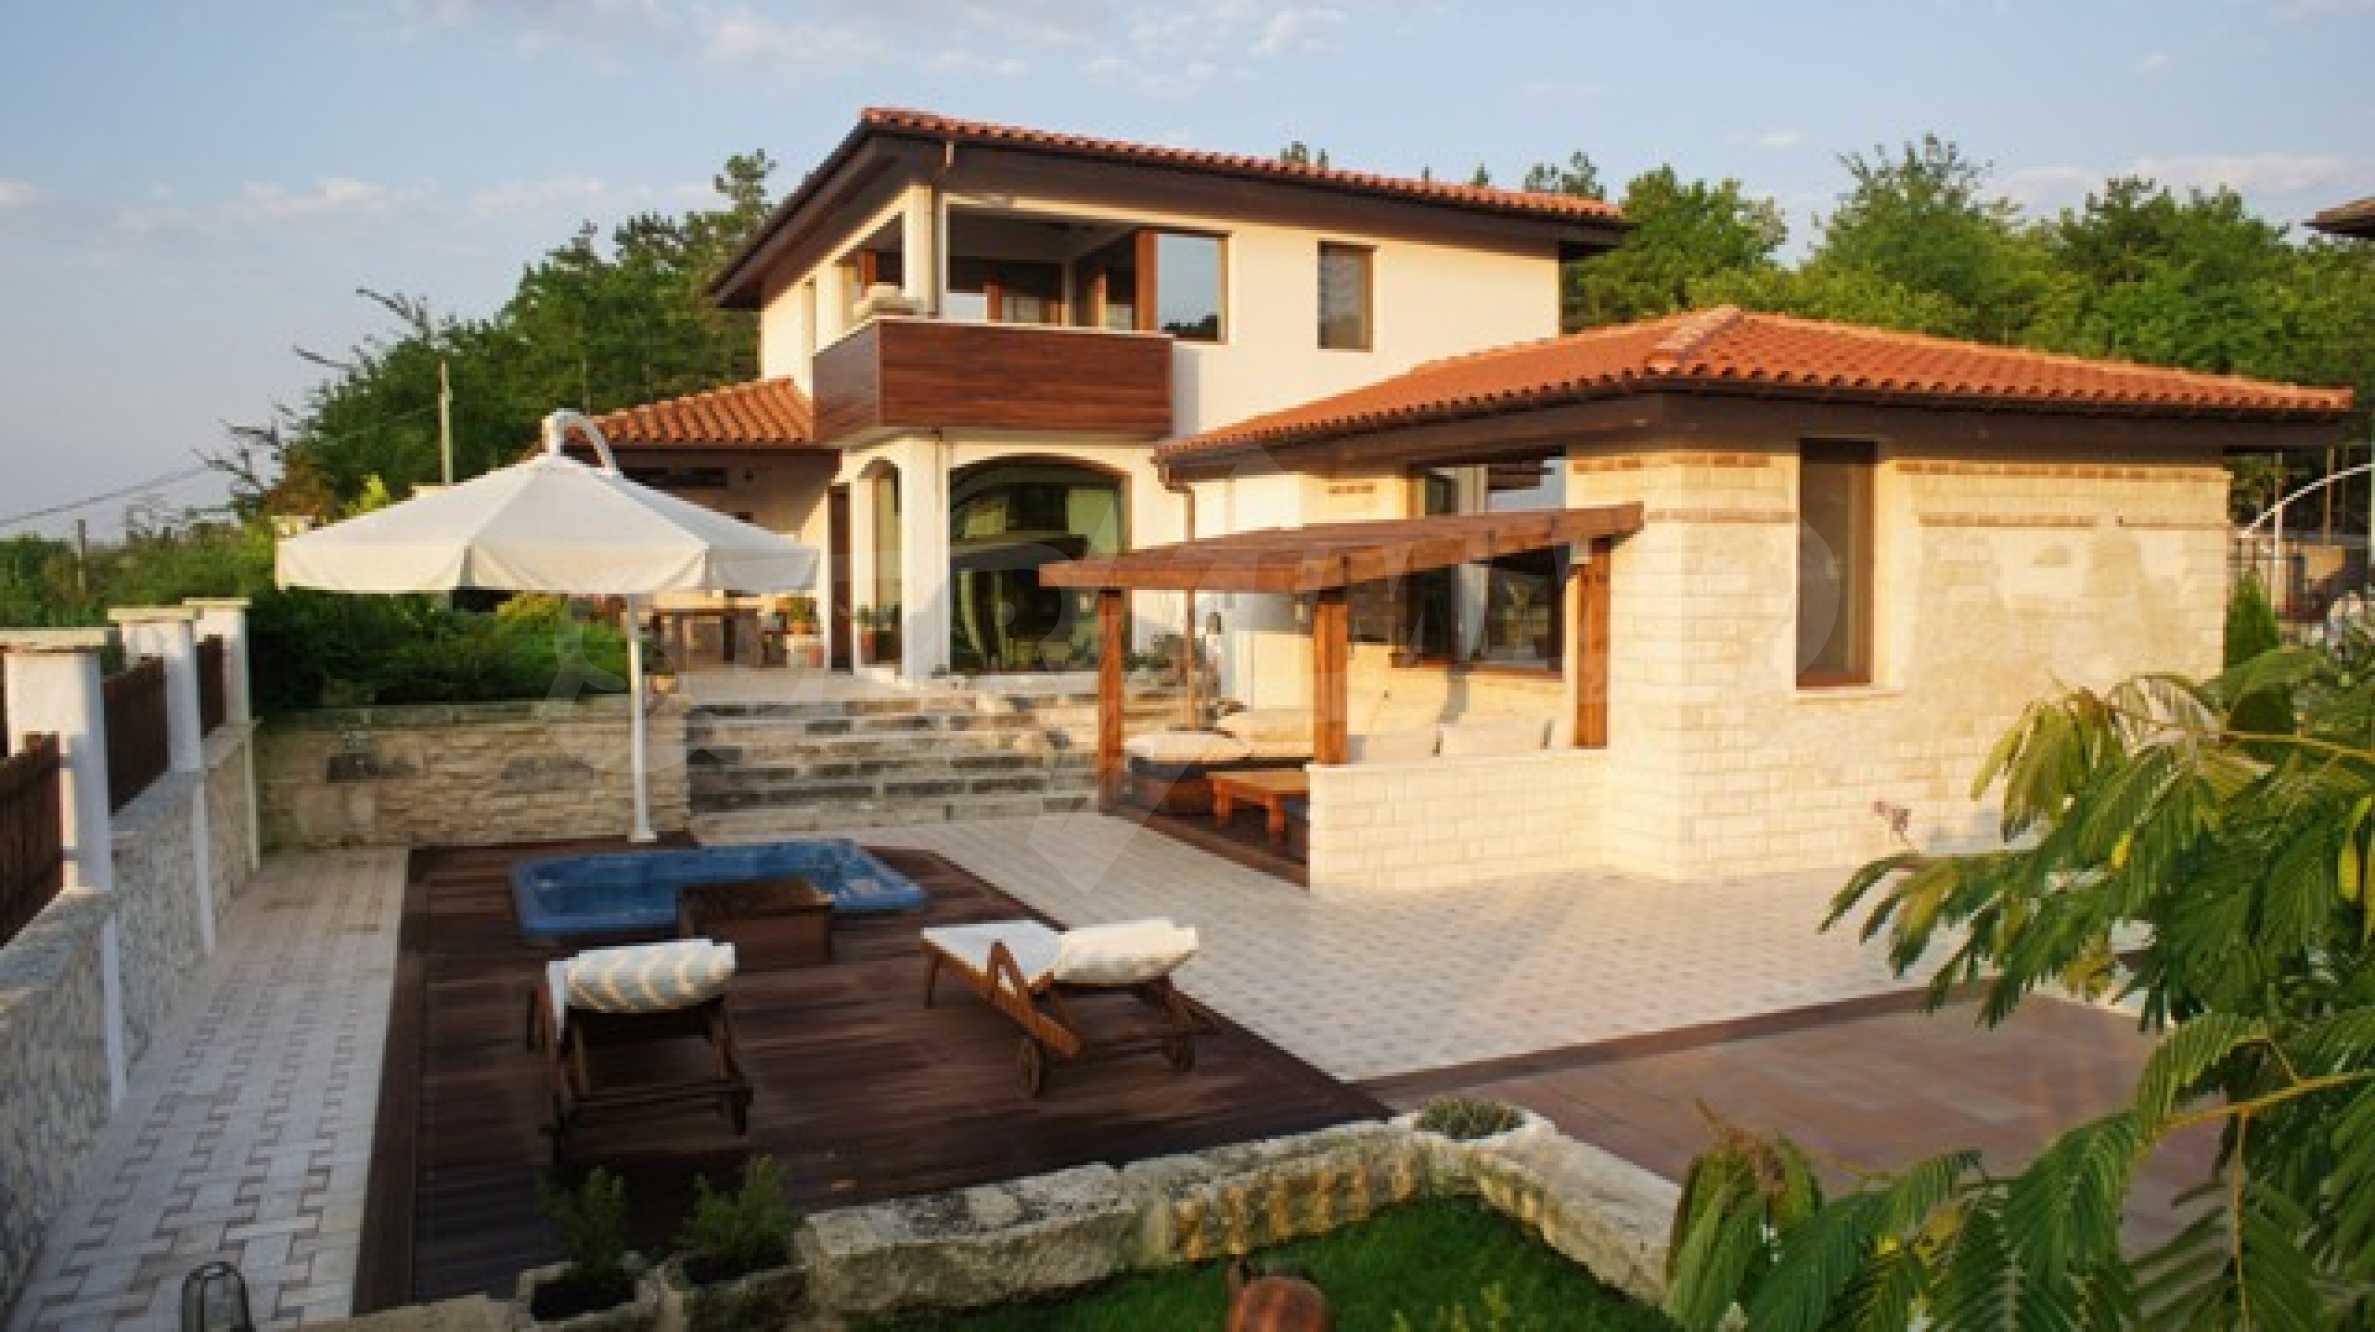 The Mediterranean style - a sense of luxury 6